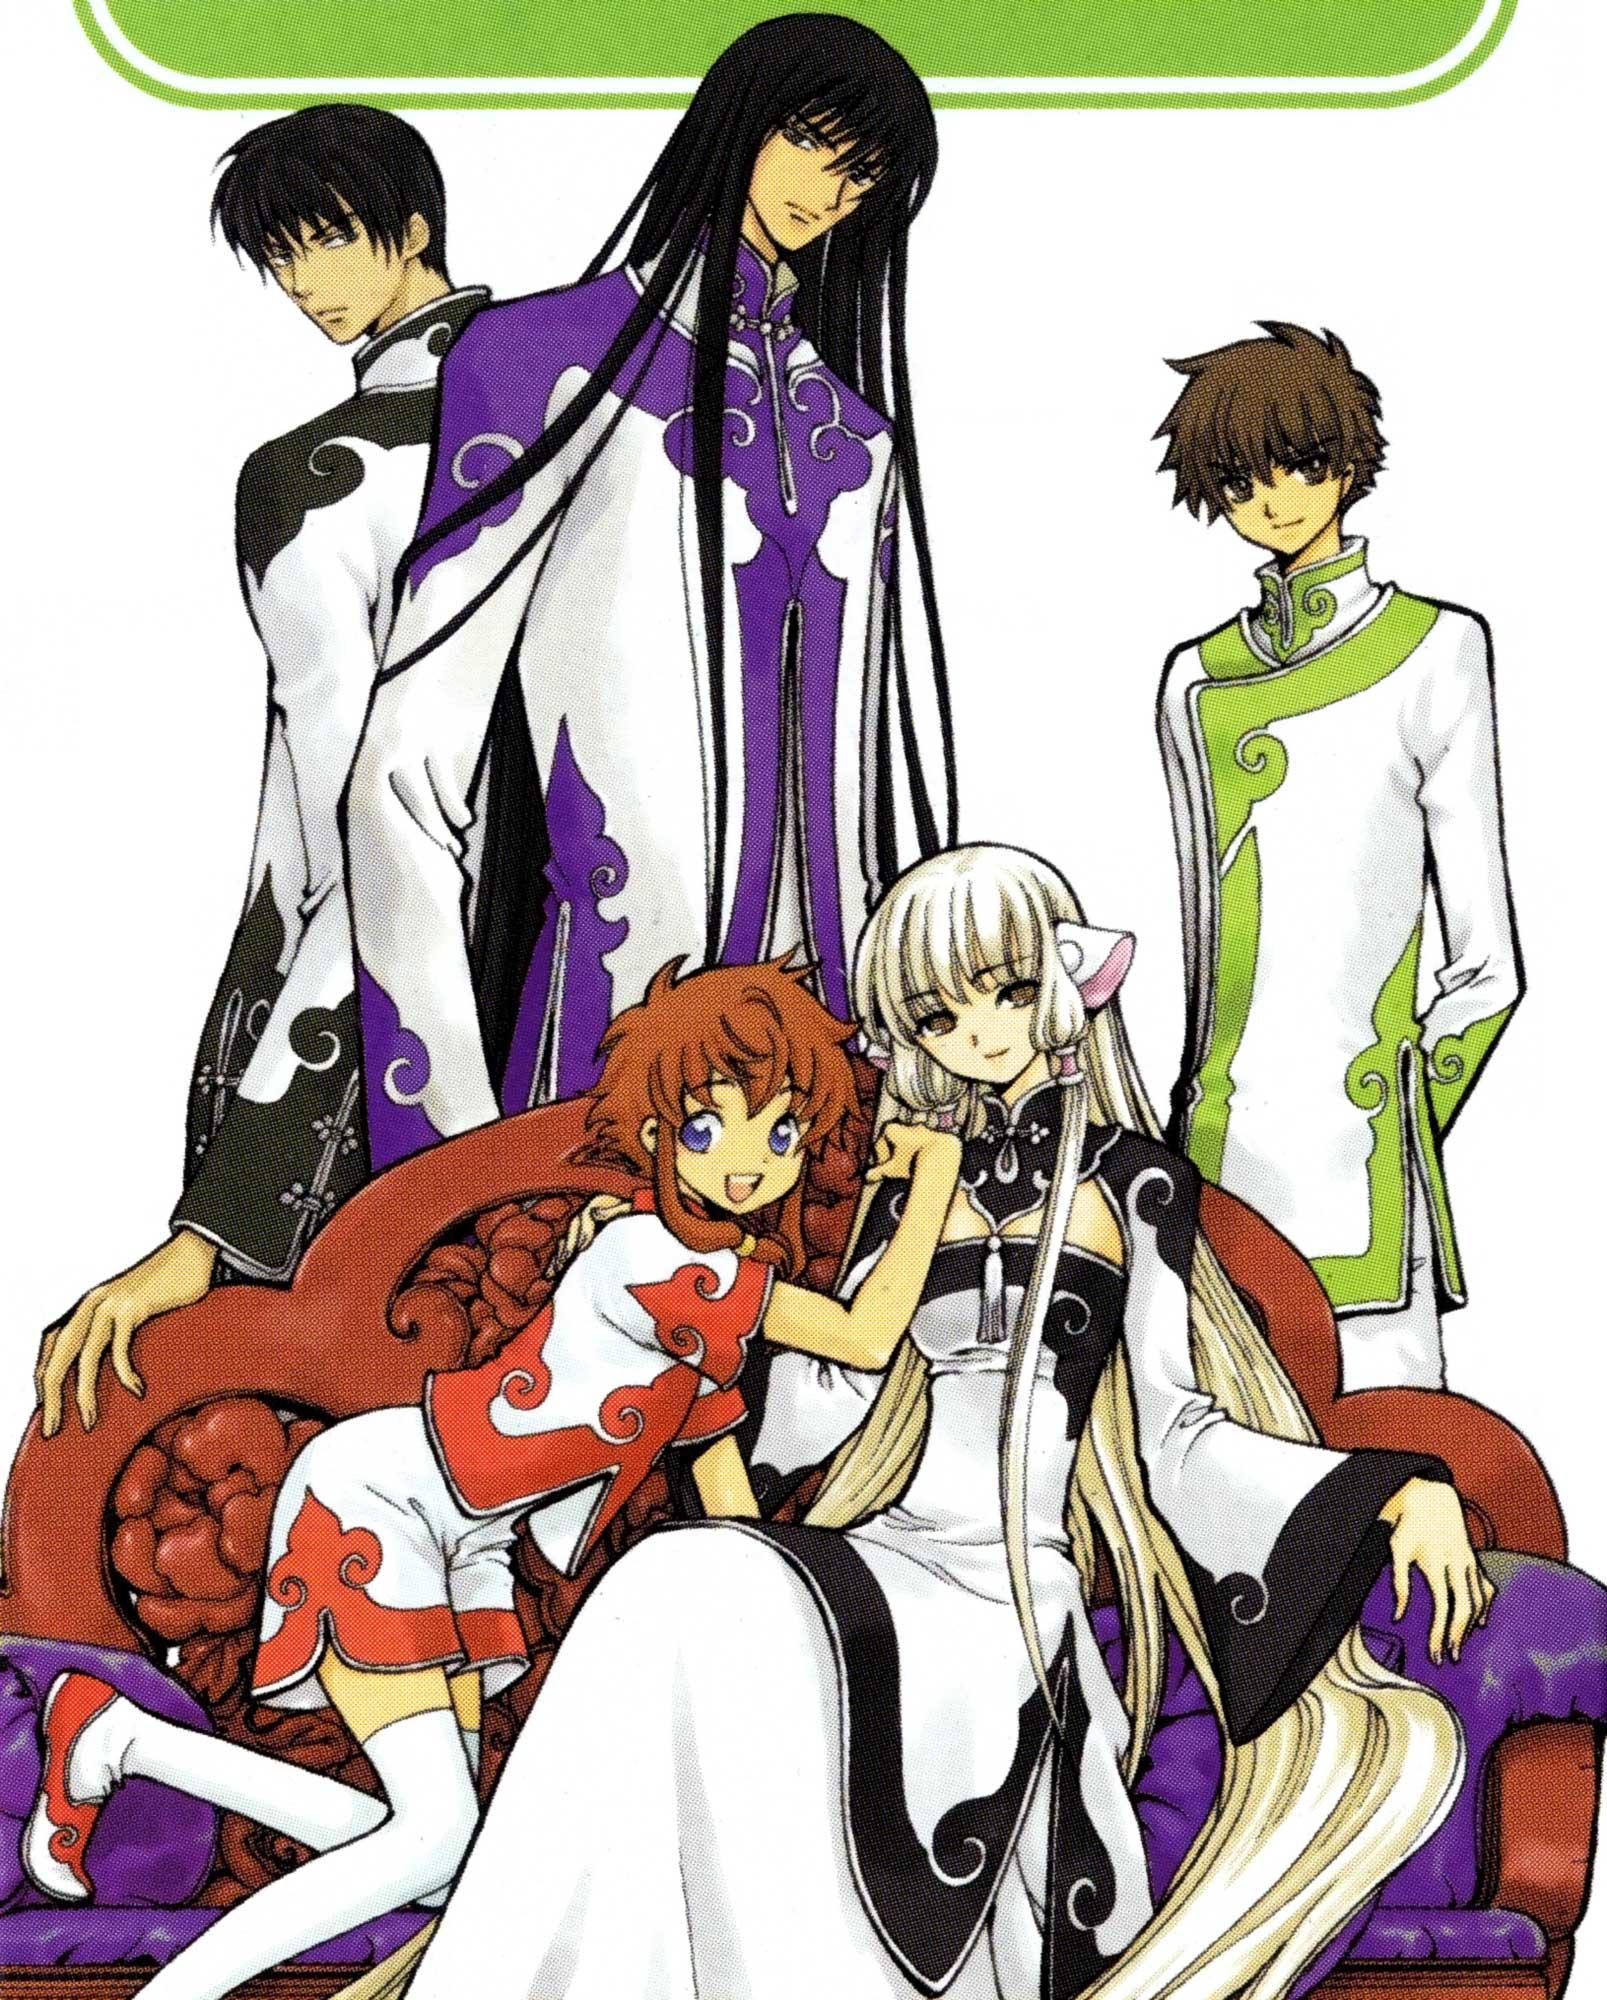 Li Syaoran Trc 24577: Zerochan Anime Image Board